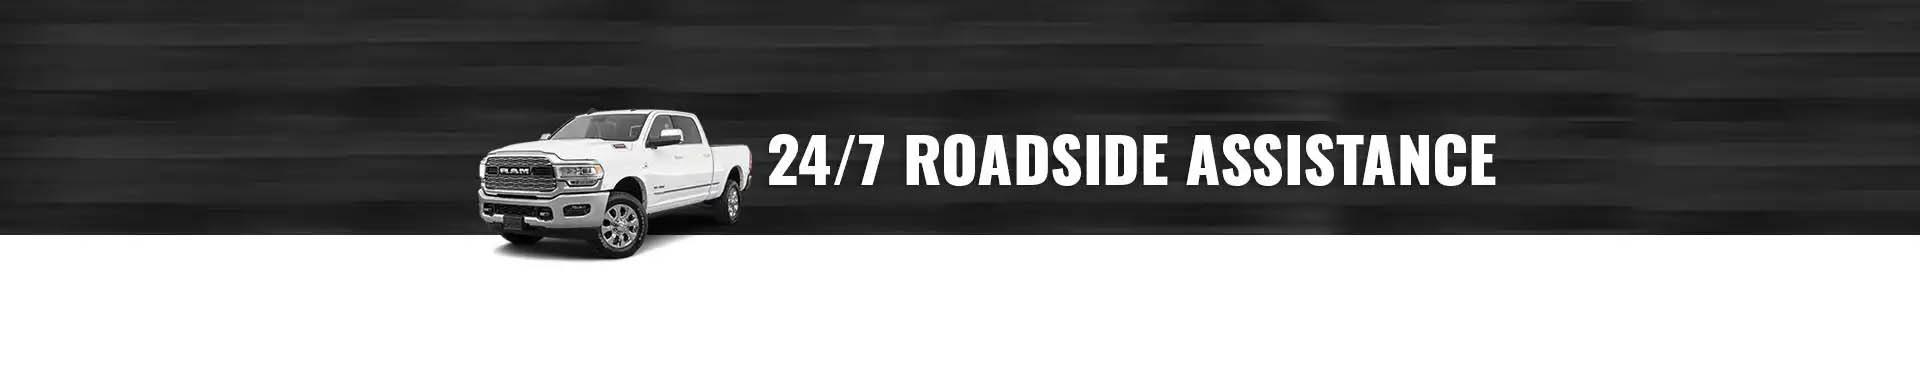 24/7 Roadside assistance